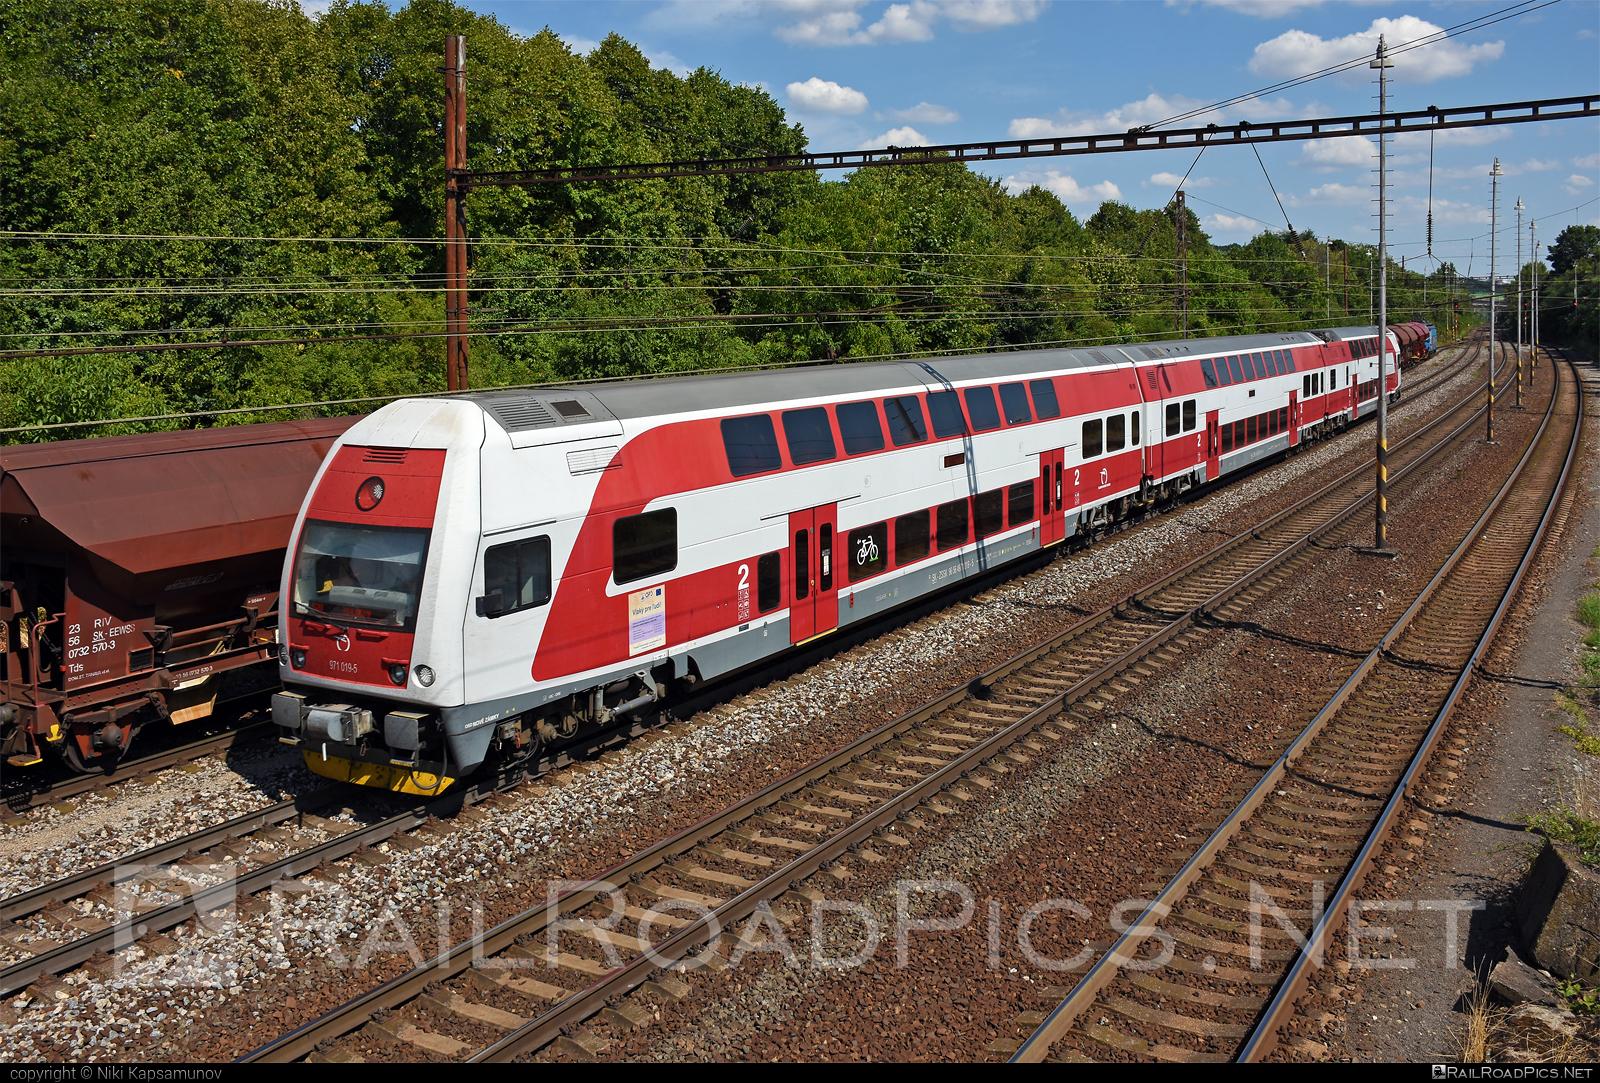 Škoda 4Ev - 971 019-5 operated by Železničná Spoločnost' Slovensko, a.s. #ZeleznicnaSpolocnostSlovensko #emu671 #janosik #skoda #skoda4ev #skodaclass671 #zssk